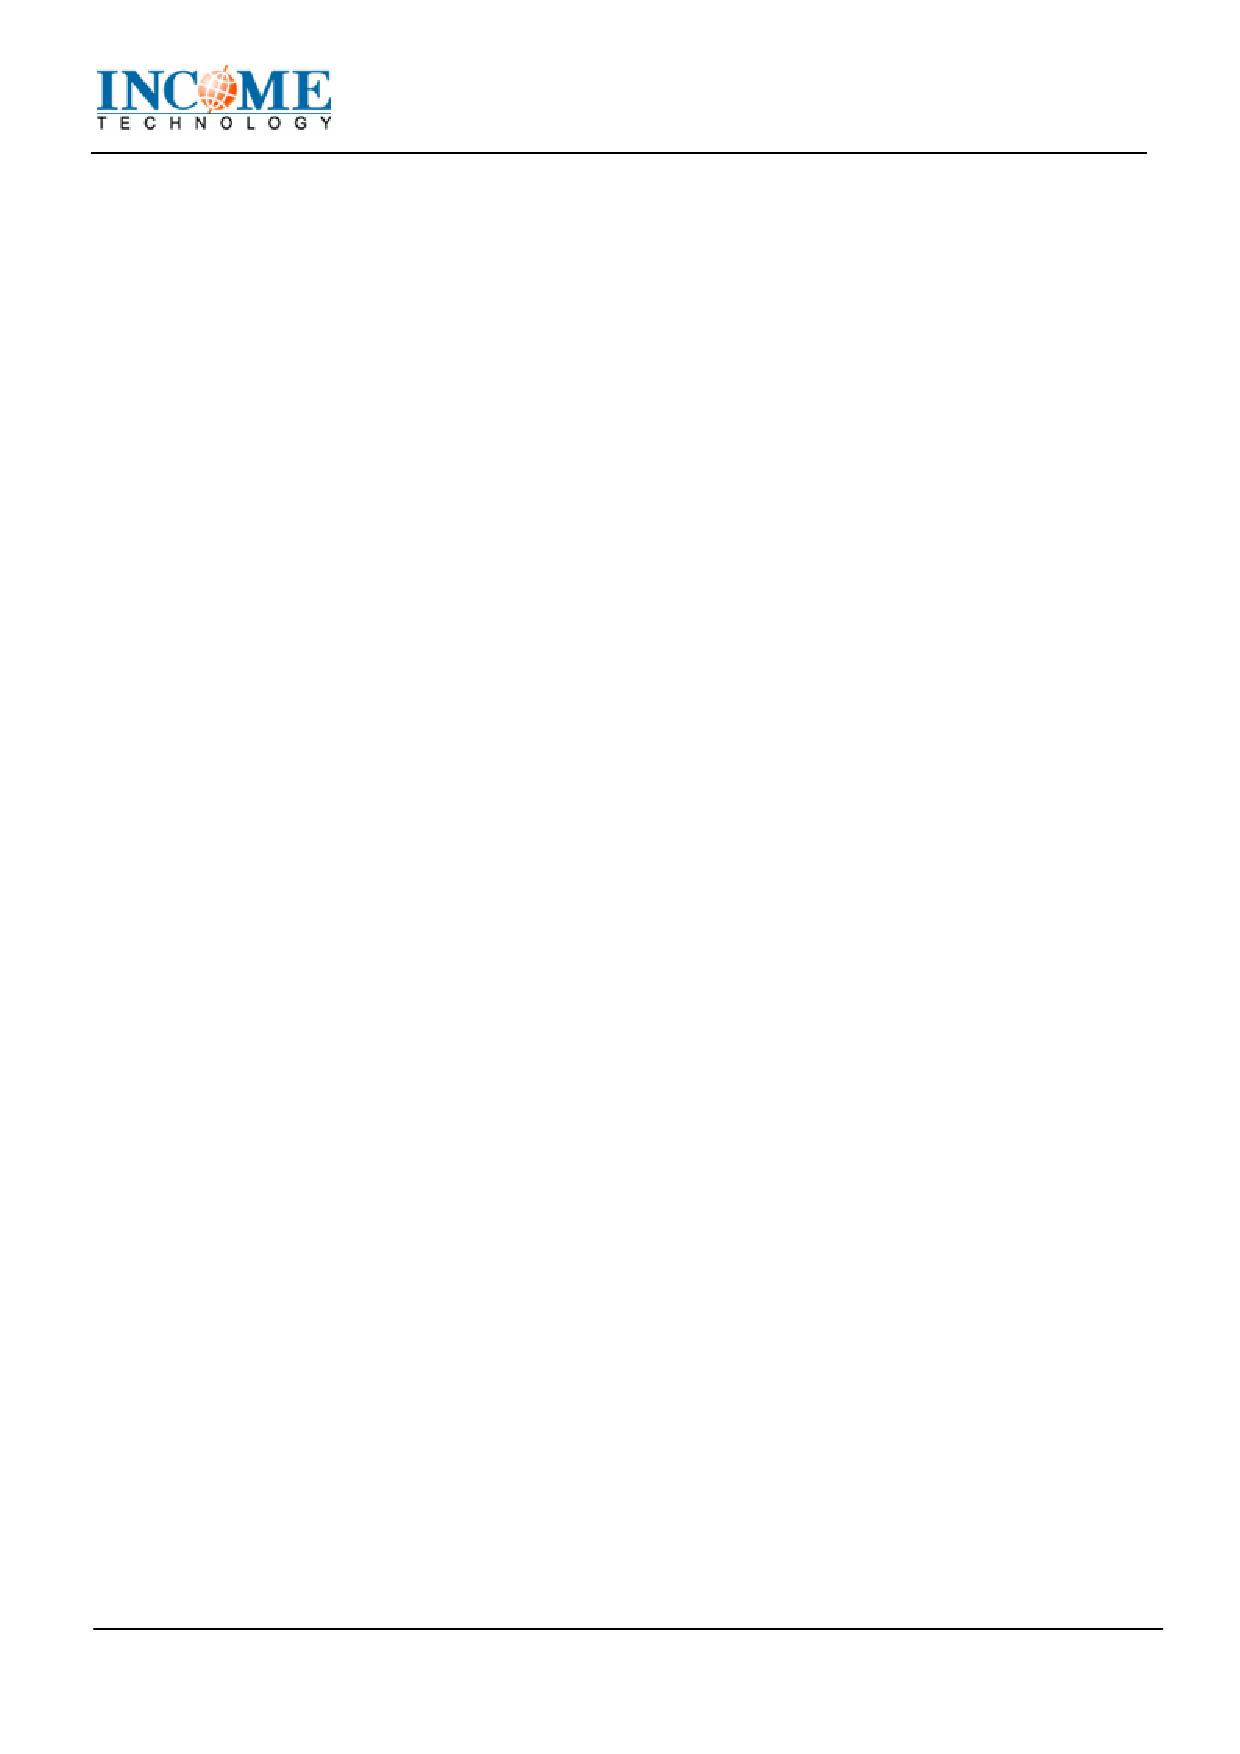 8002 Даташит, Описание, Даташиты